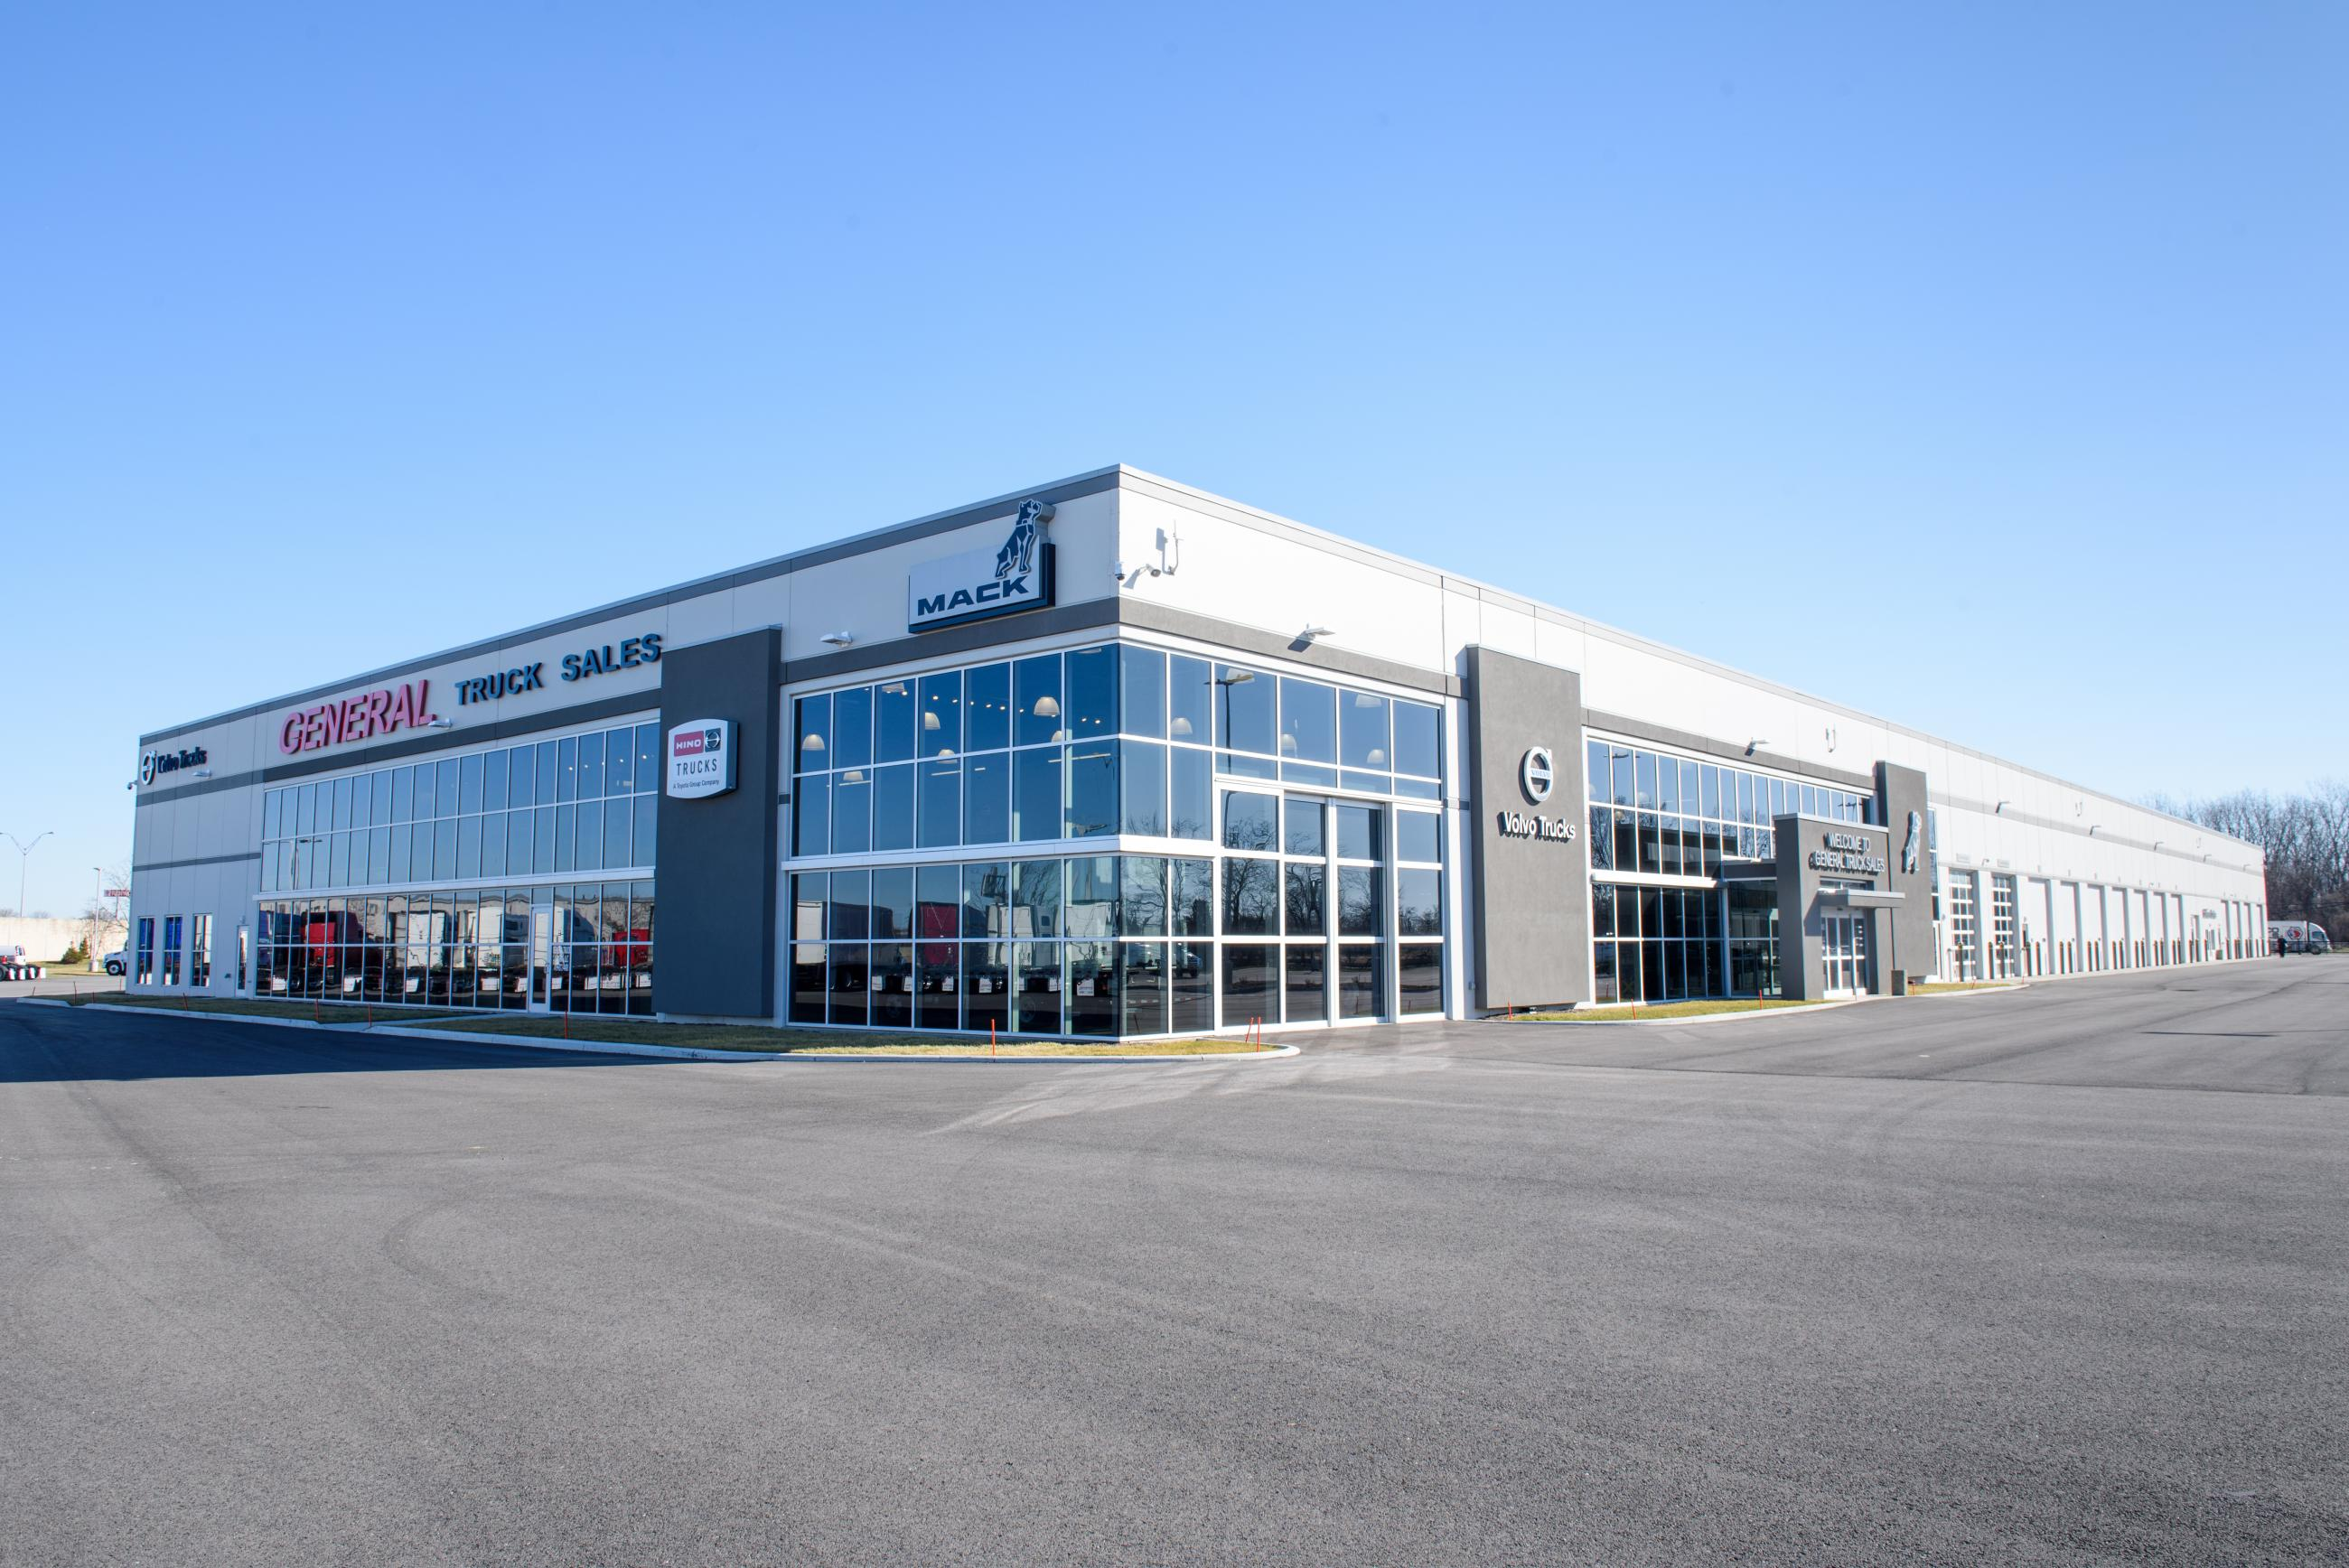 Dodge Dealership Indianapolis >> General Truck Sales | Custom Facilities